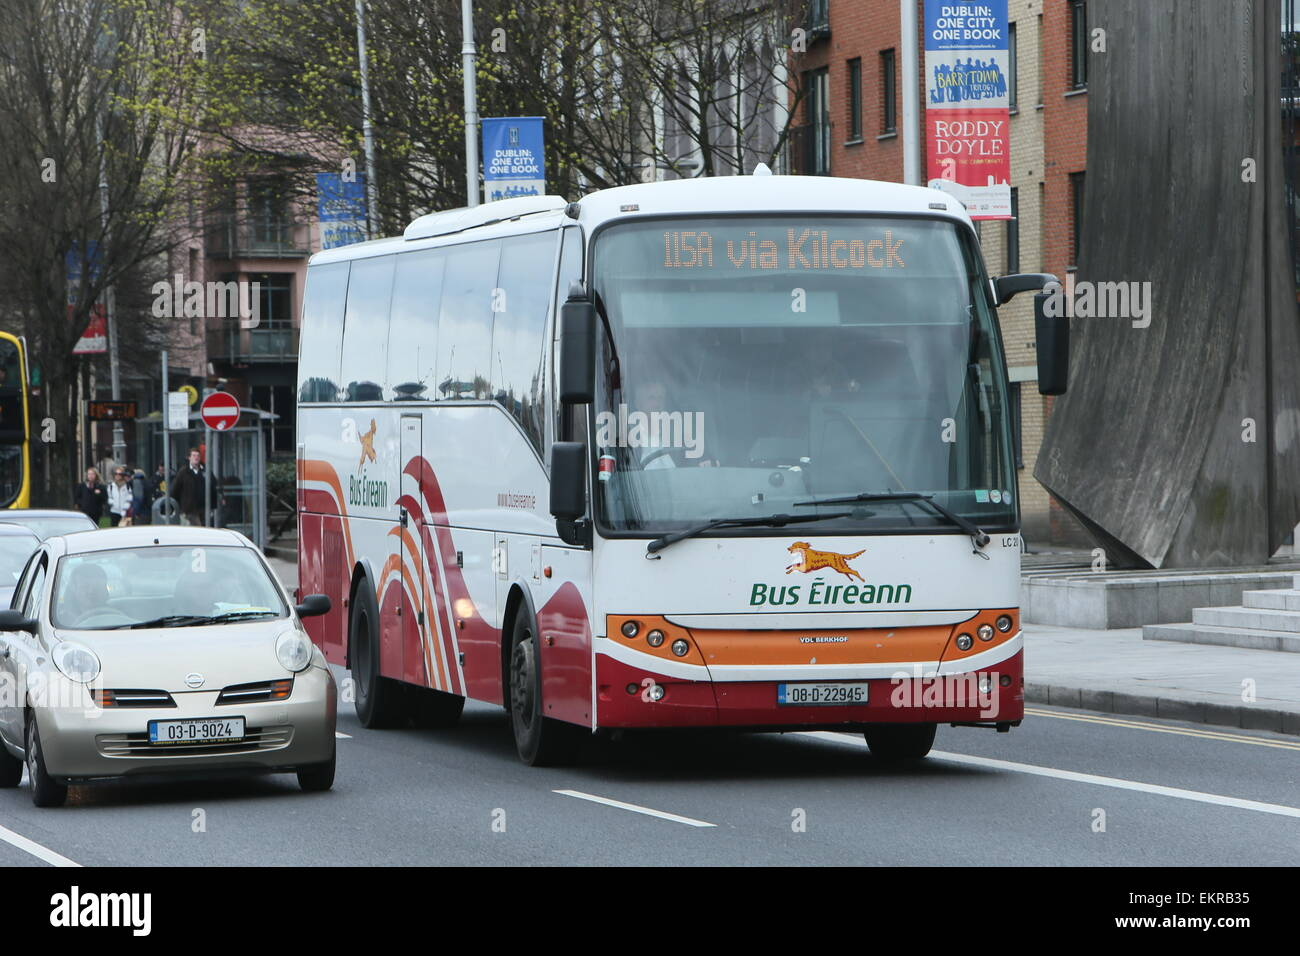 Image of a Bus Eireann vehicle on a street in Dublin city centre  A